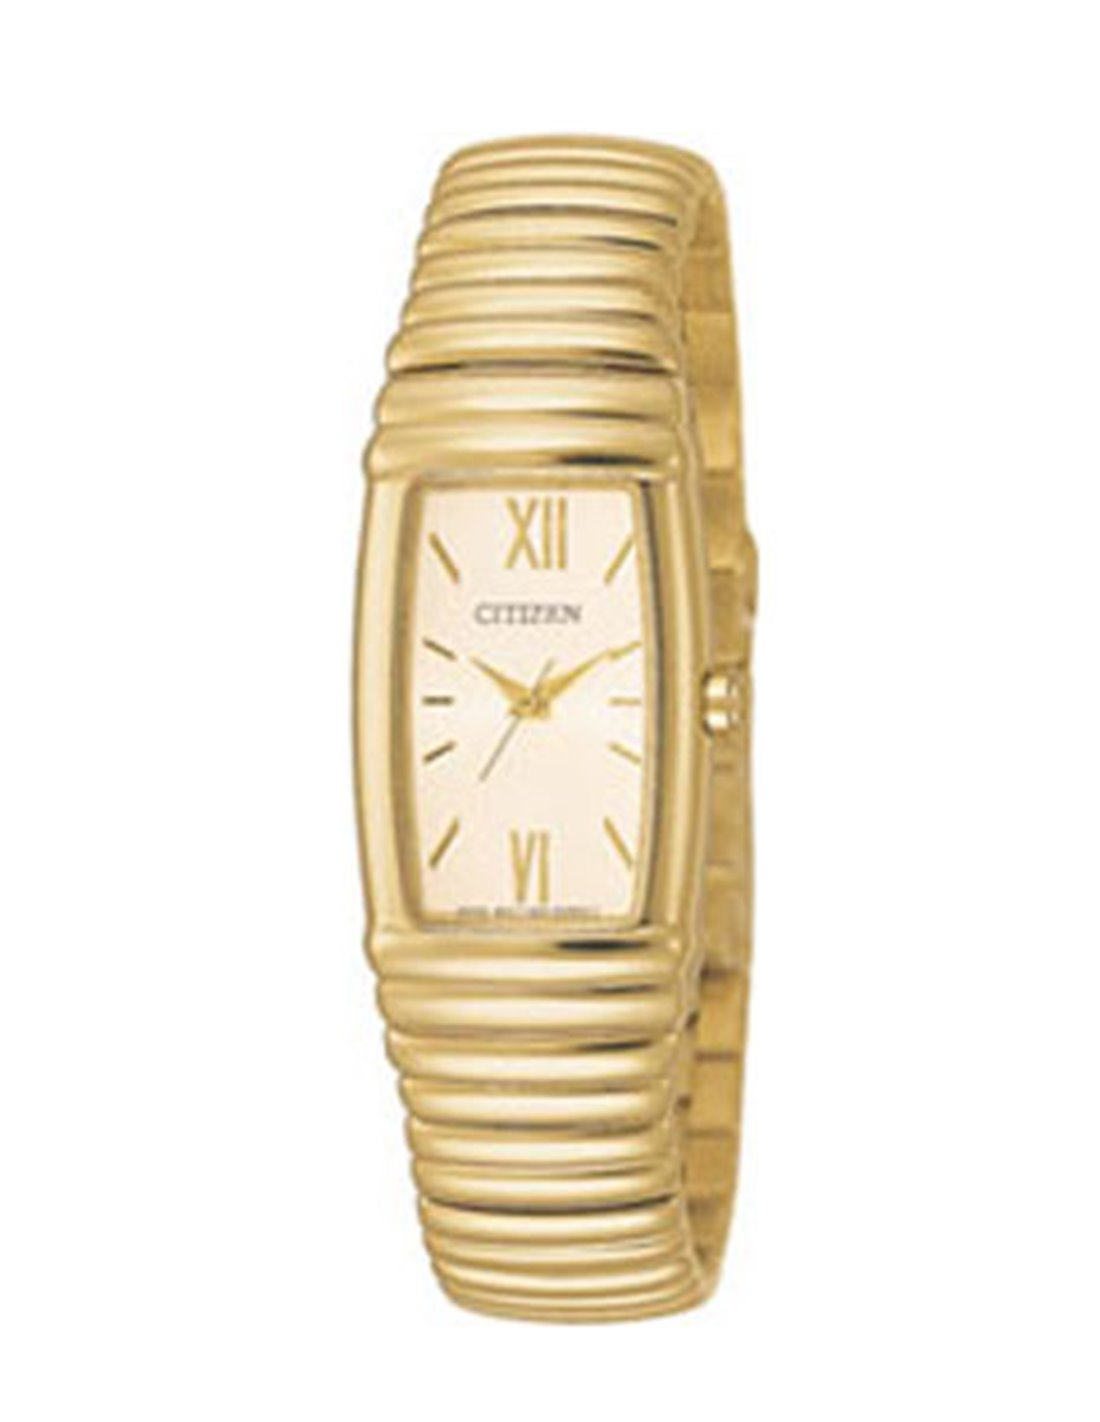 Reloj Citizen Eco Drive de mujer enchapado en oro modelo EM0336 59D